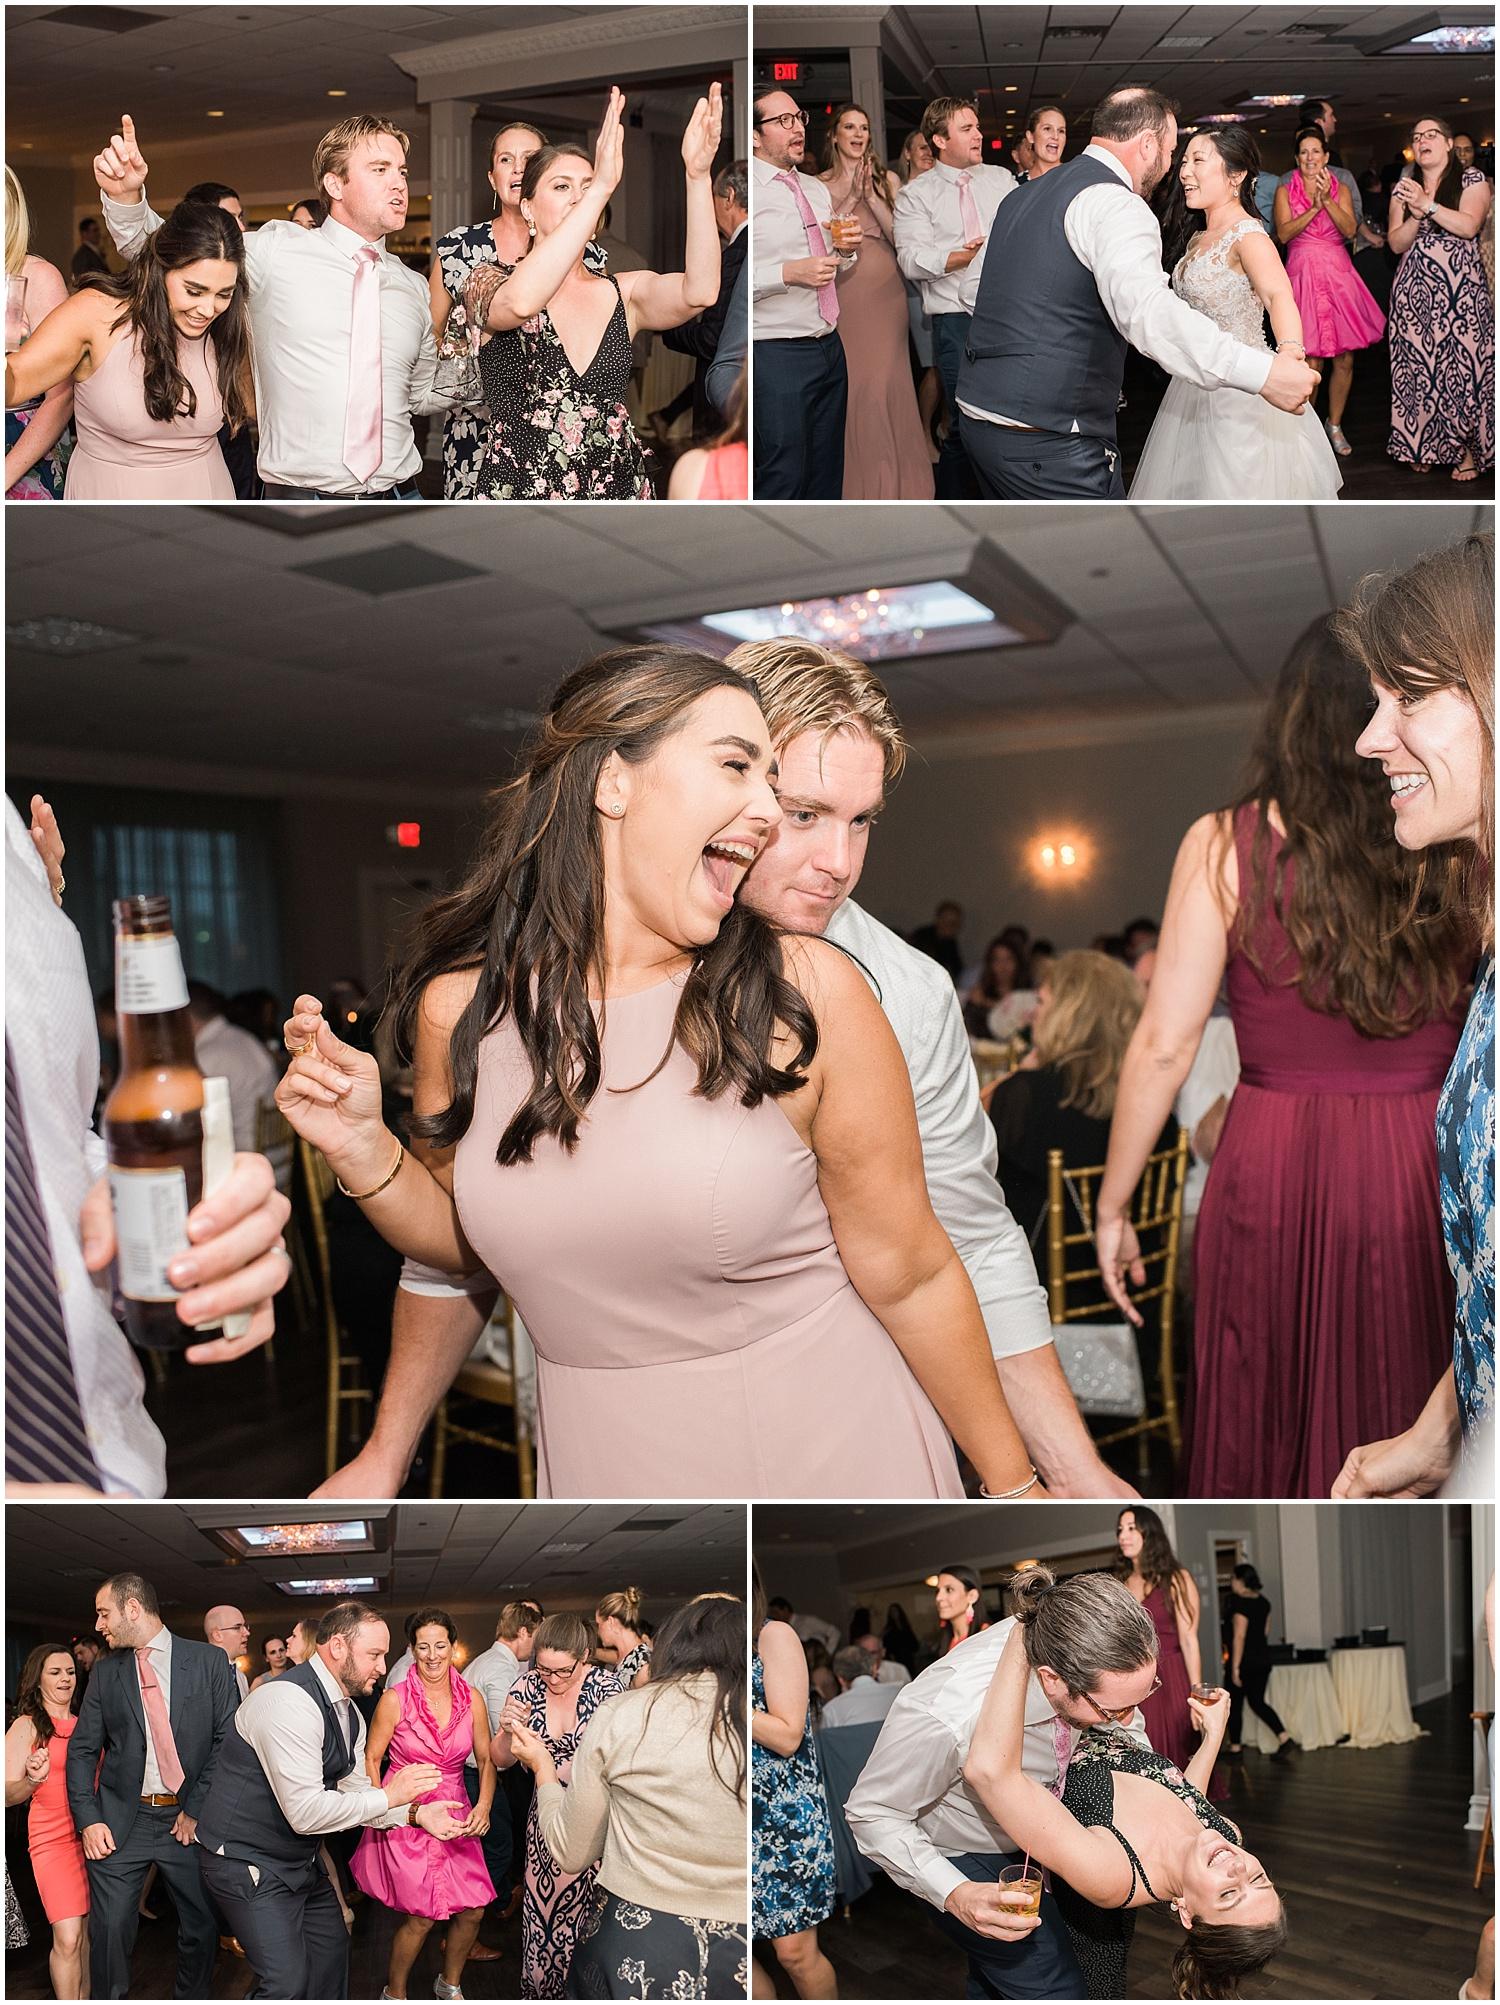 new jersey outdoor wedding, Monmouth University Wilson Hall, natural light photographer, hybrid photographer, reception dancing